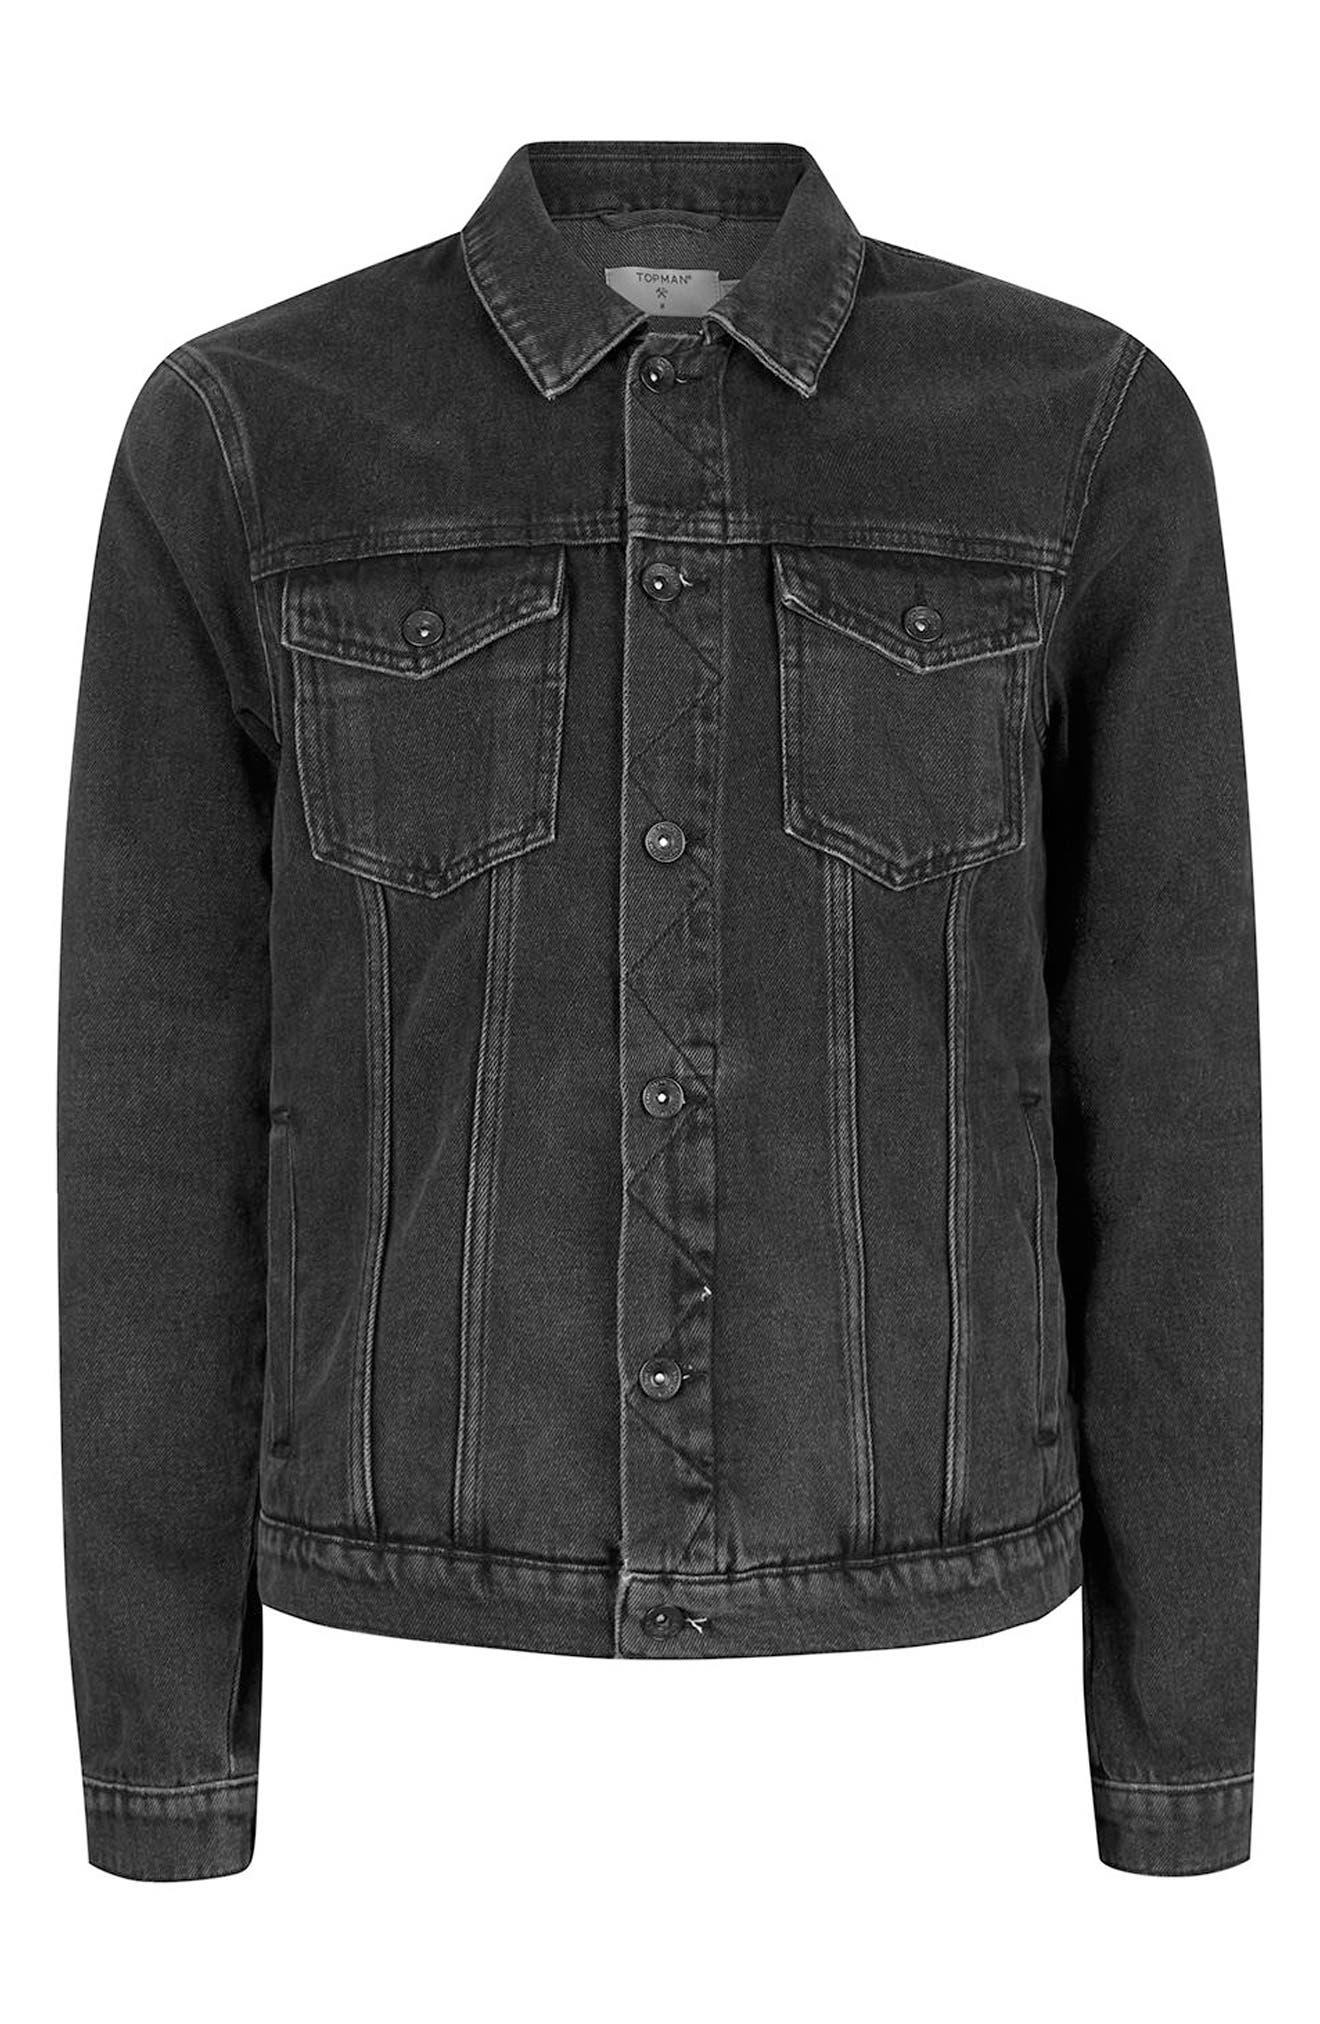 Western Denim Jacket,                             Alternate thumbnail 4, color,                             001